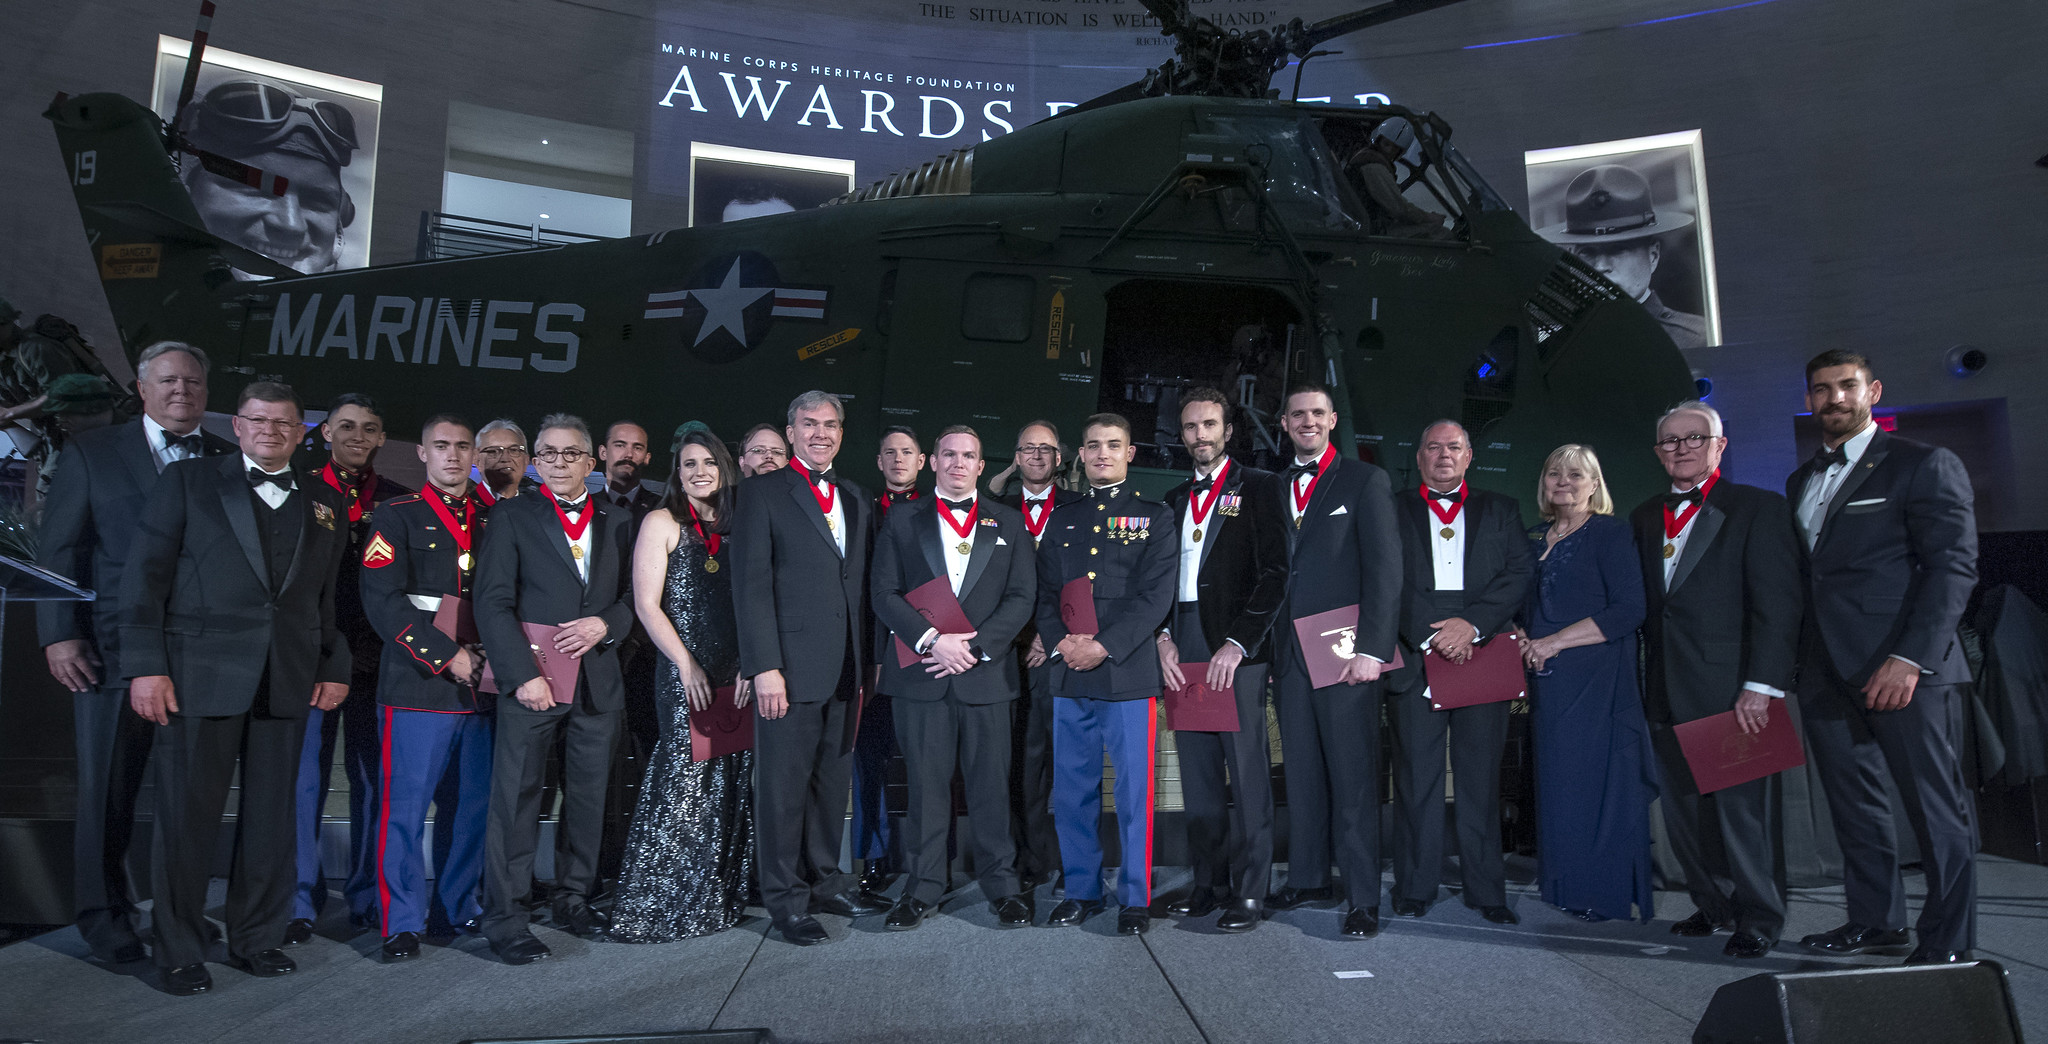 Event Photo Galleries - Marine Corps Heritage Foundation